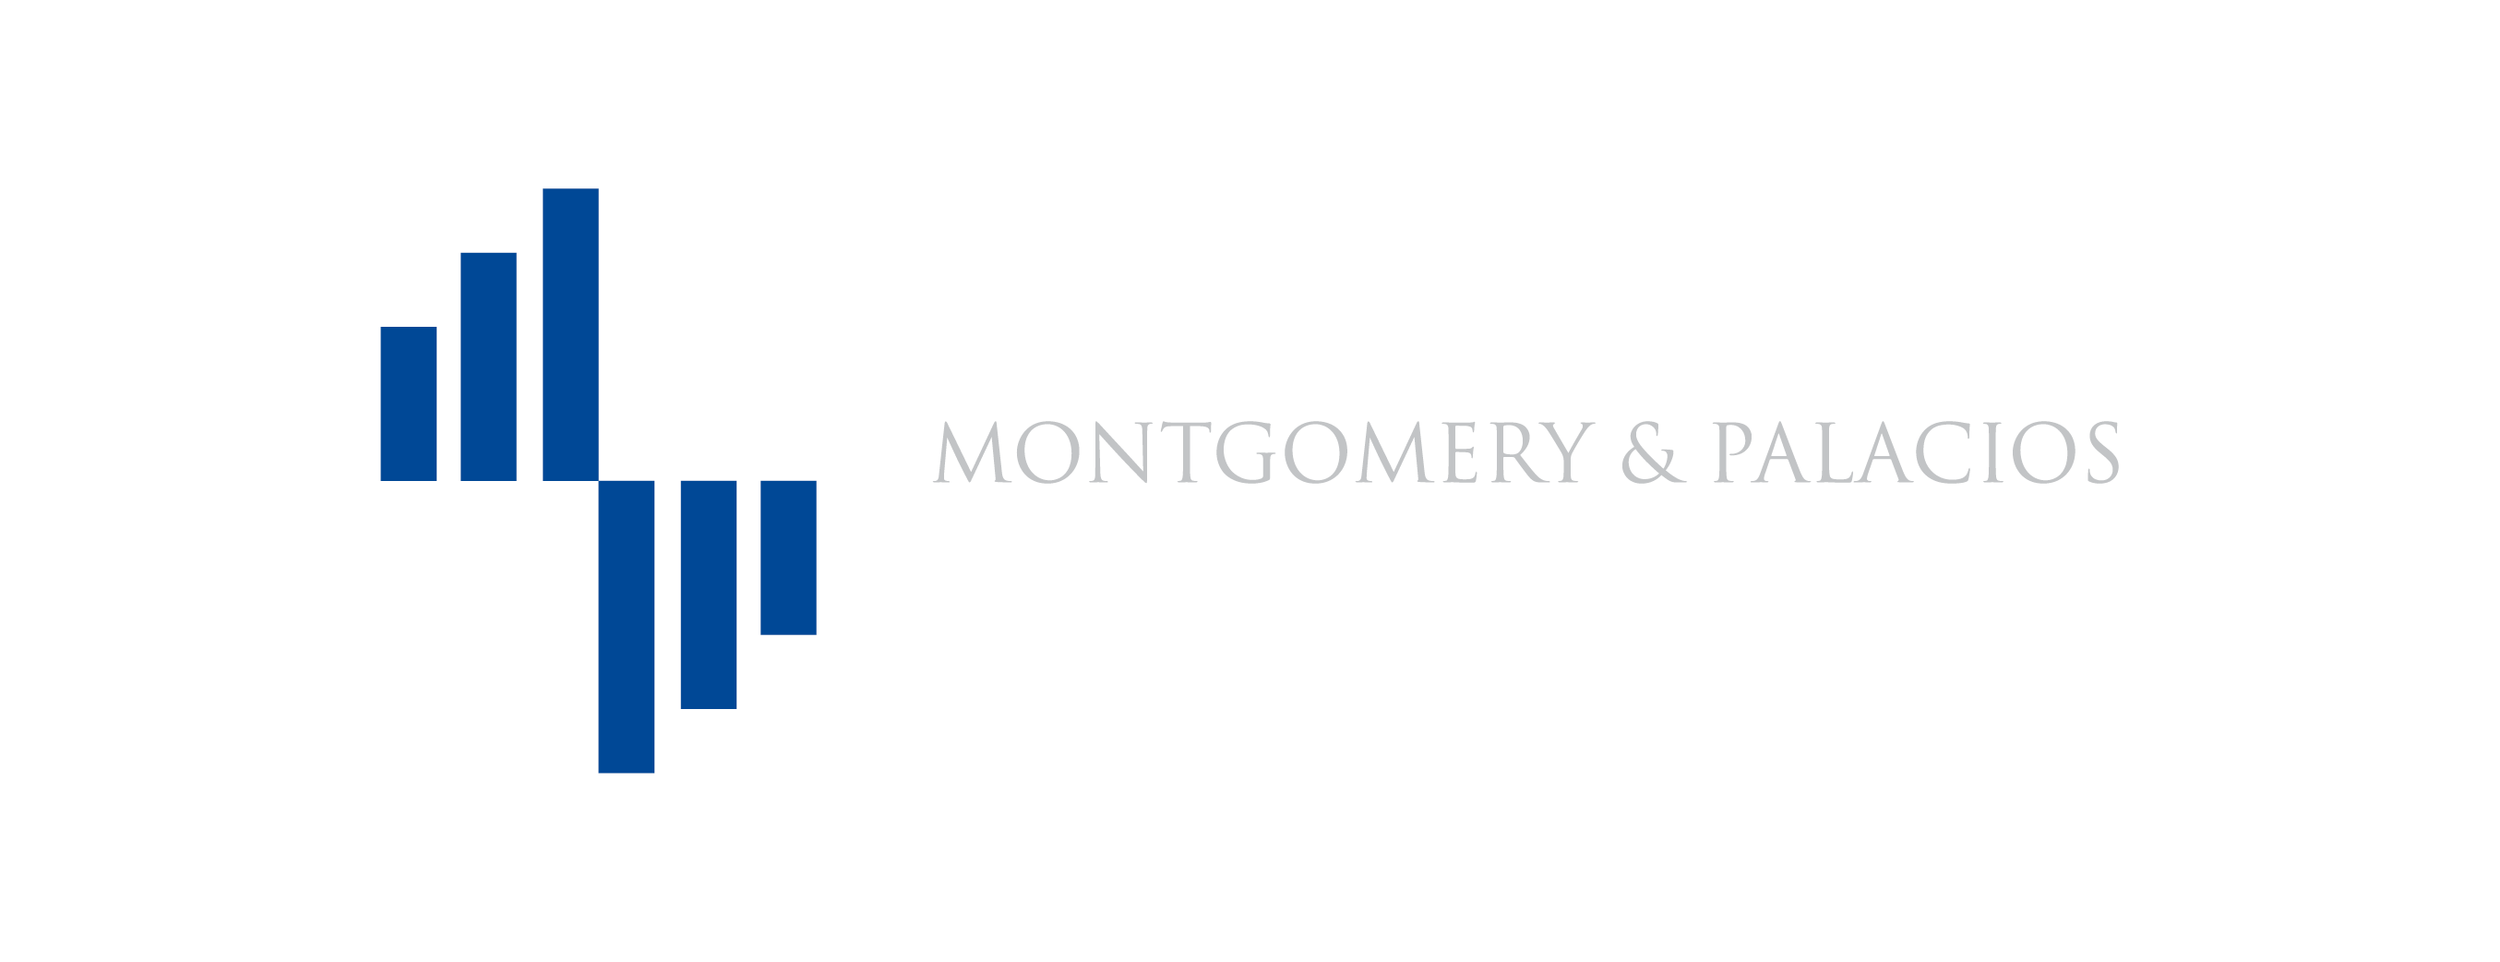 Montgomery & Palacios